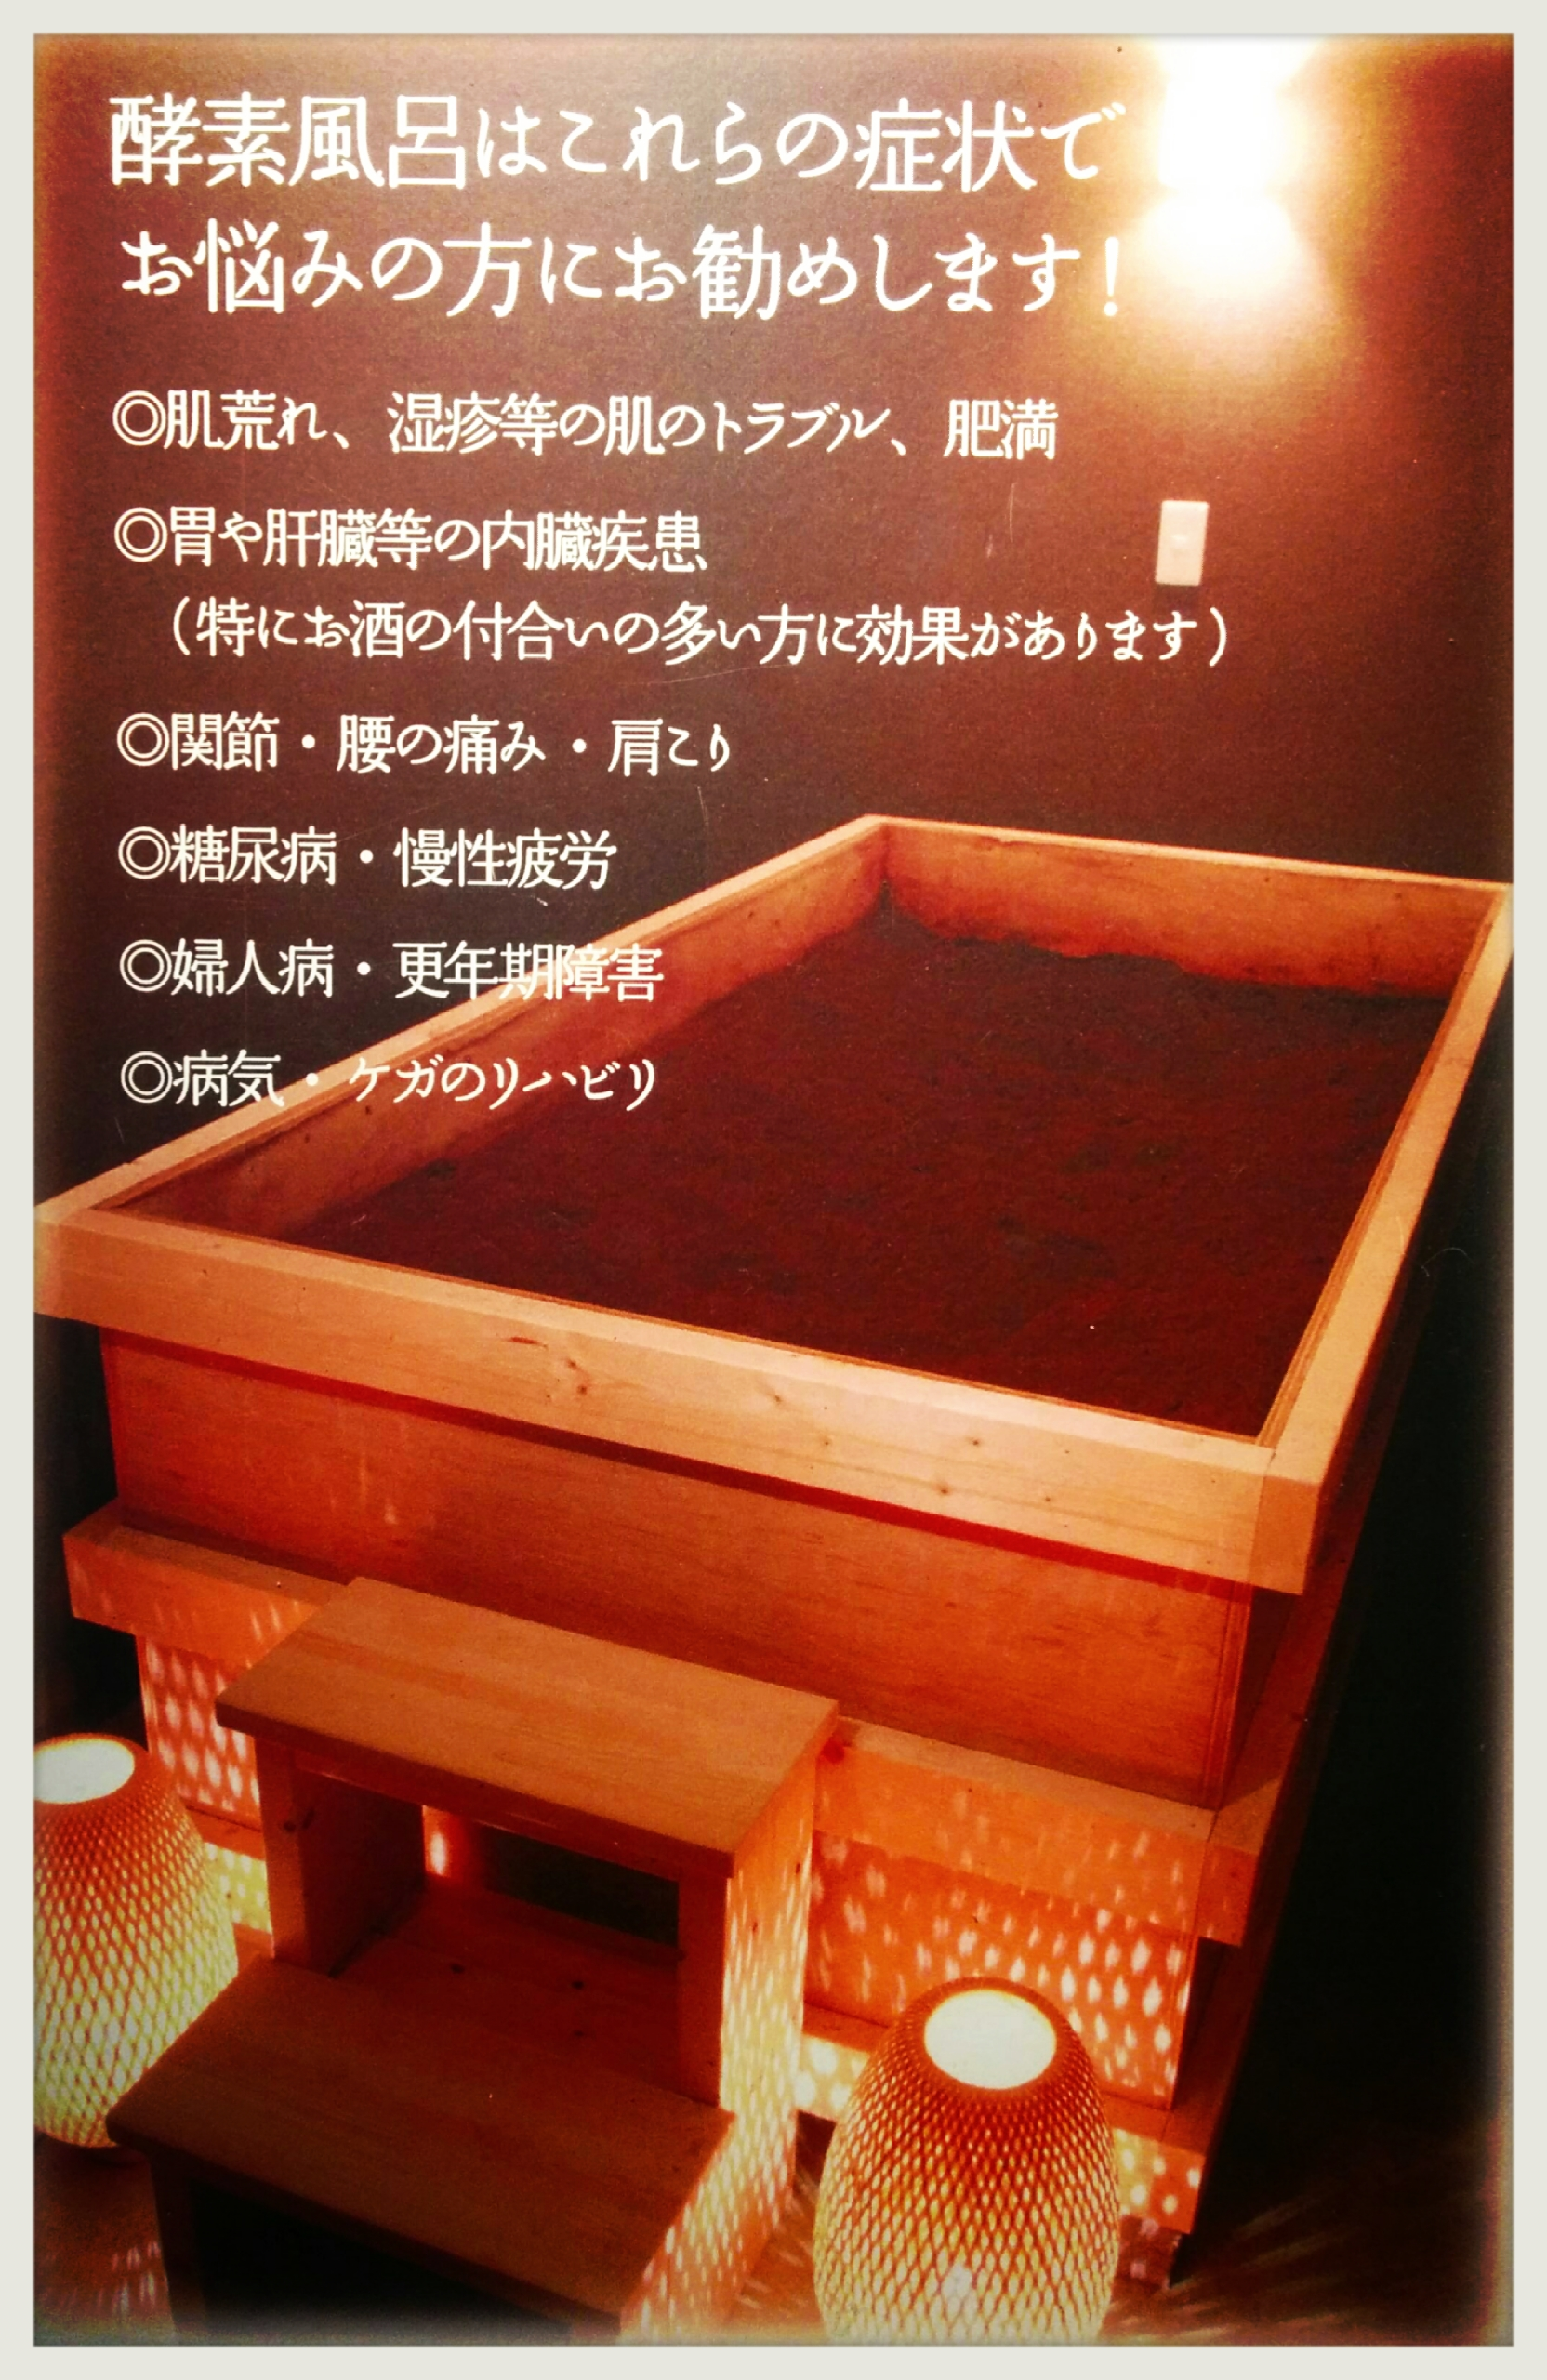 風呂 酵素